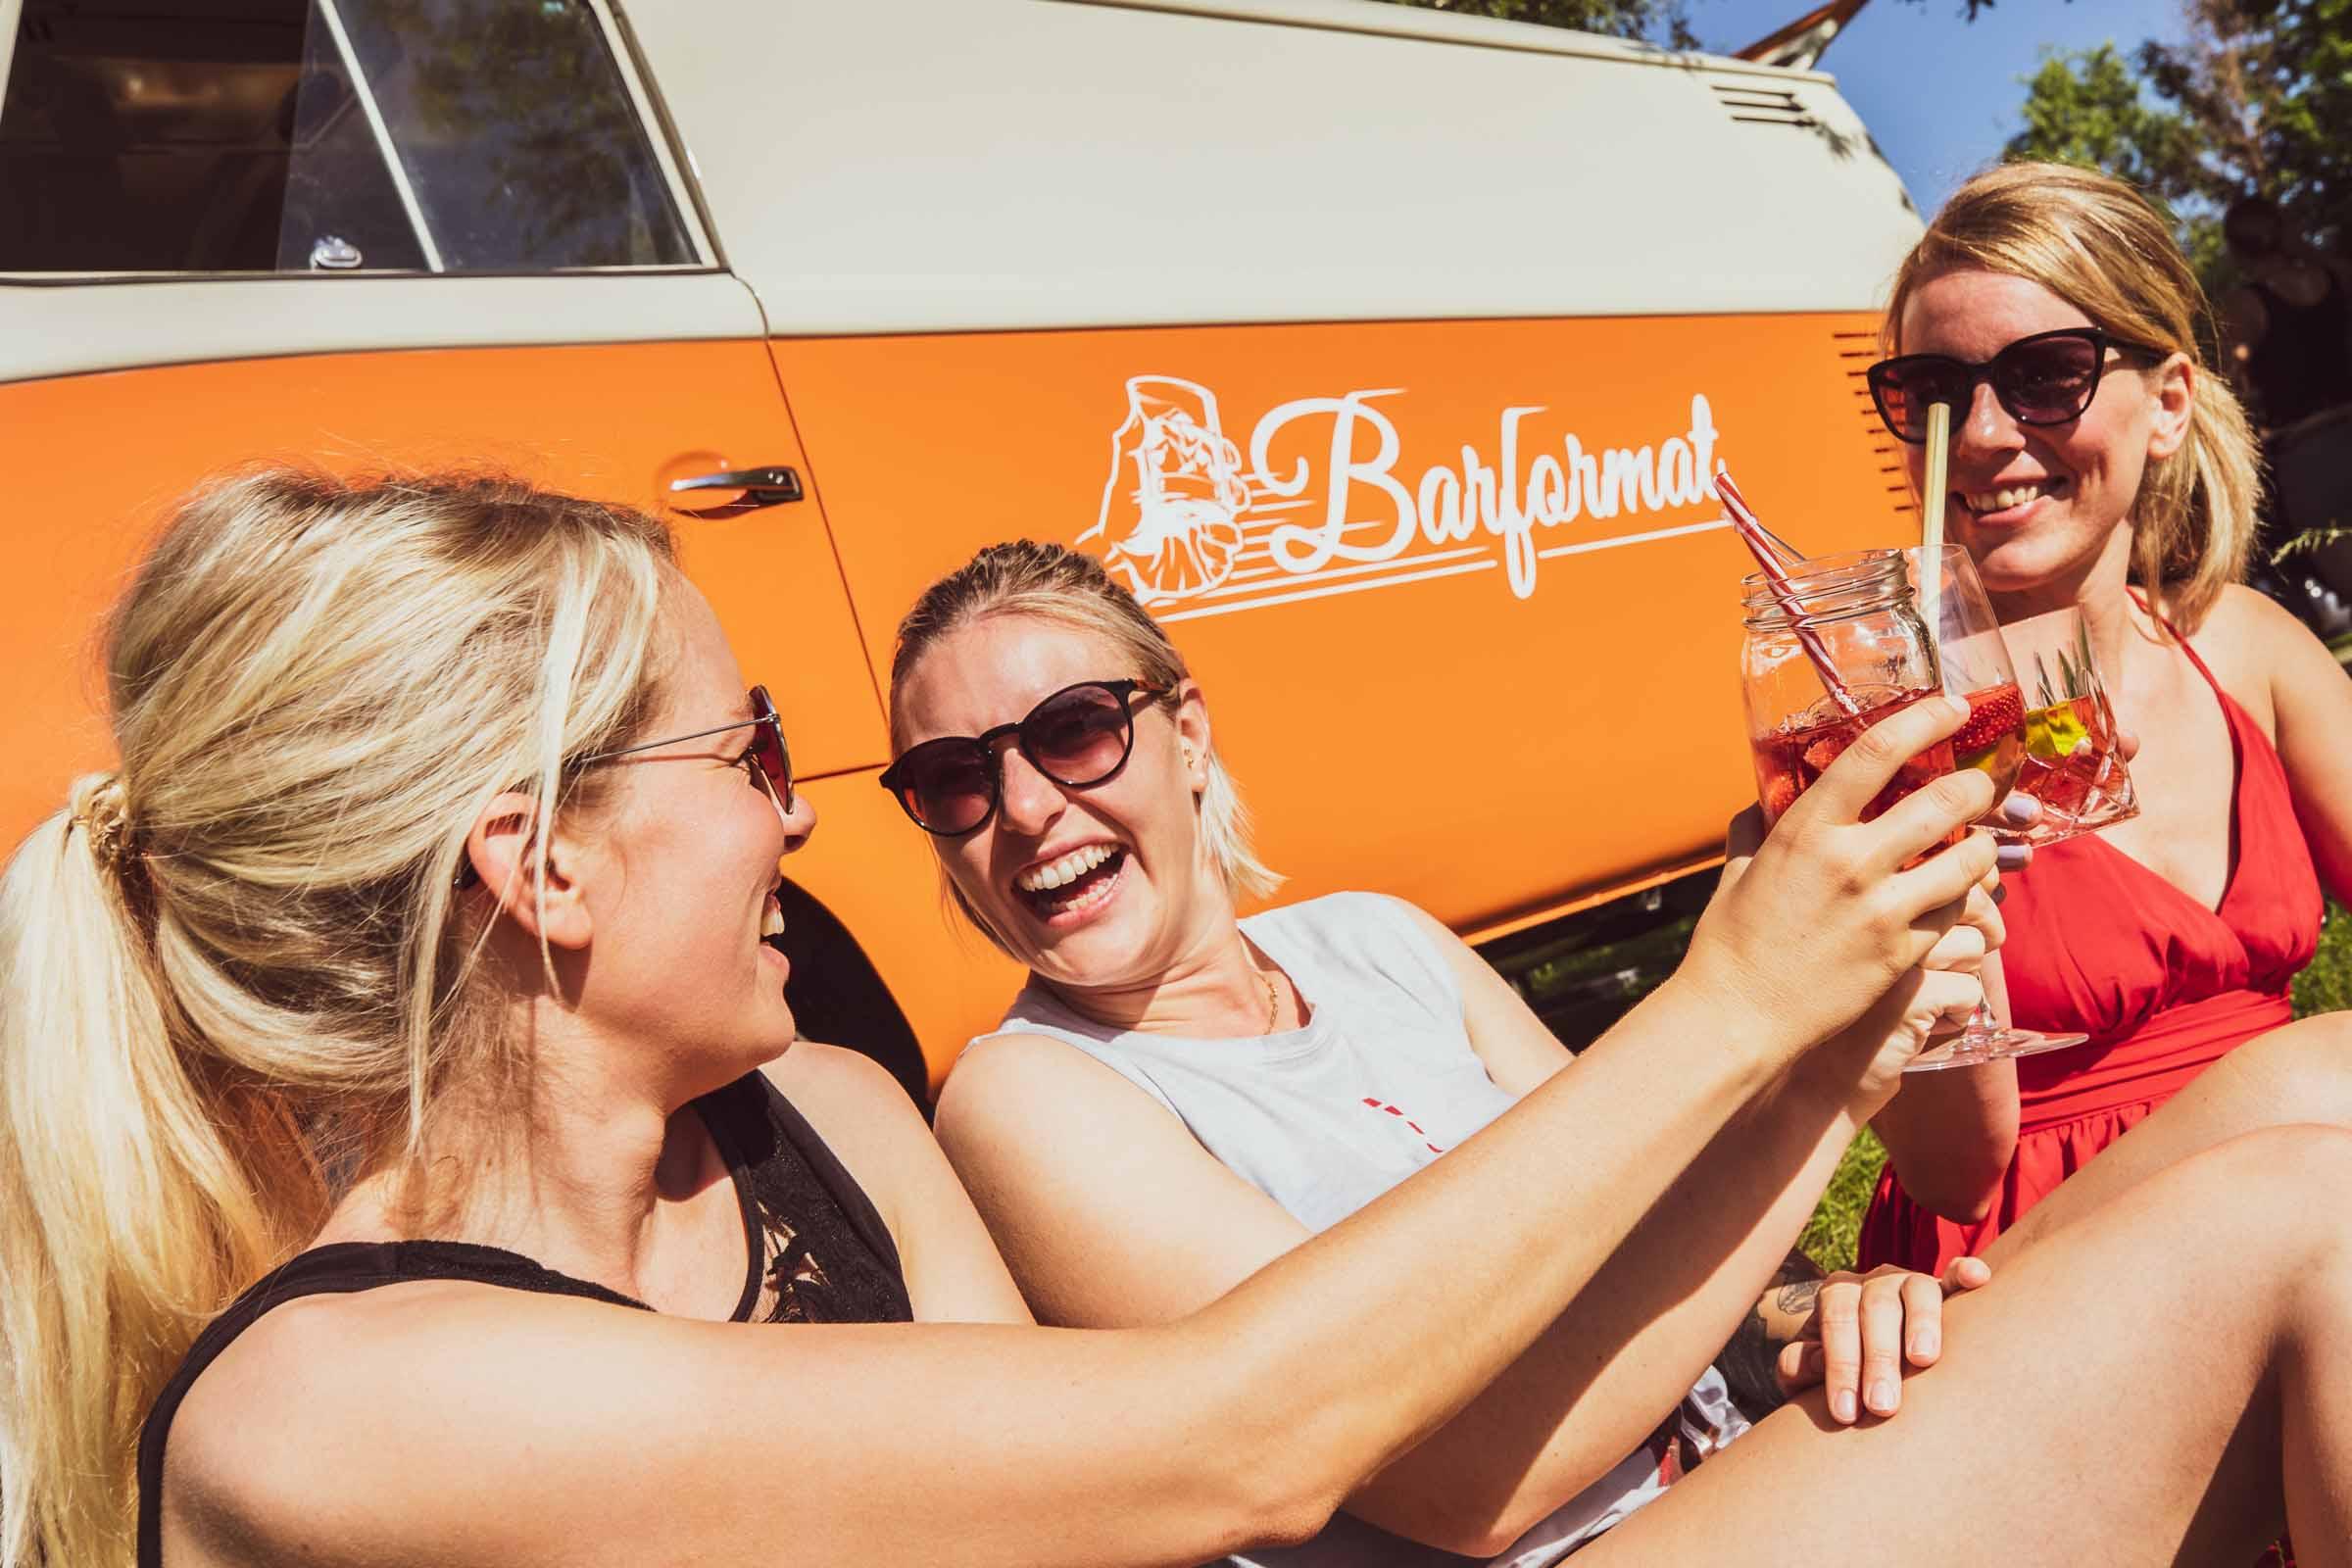 Mobile | Bar | Hannover | Cocktailservice | Getränke | Catering | Cocktails | Wein | Aperitif | Gin |Softdrinks | Hochzeit | Trauung | Sektempfang |Messe | Firmenfeier | Buchen | Mieten | Anfragen